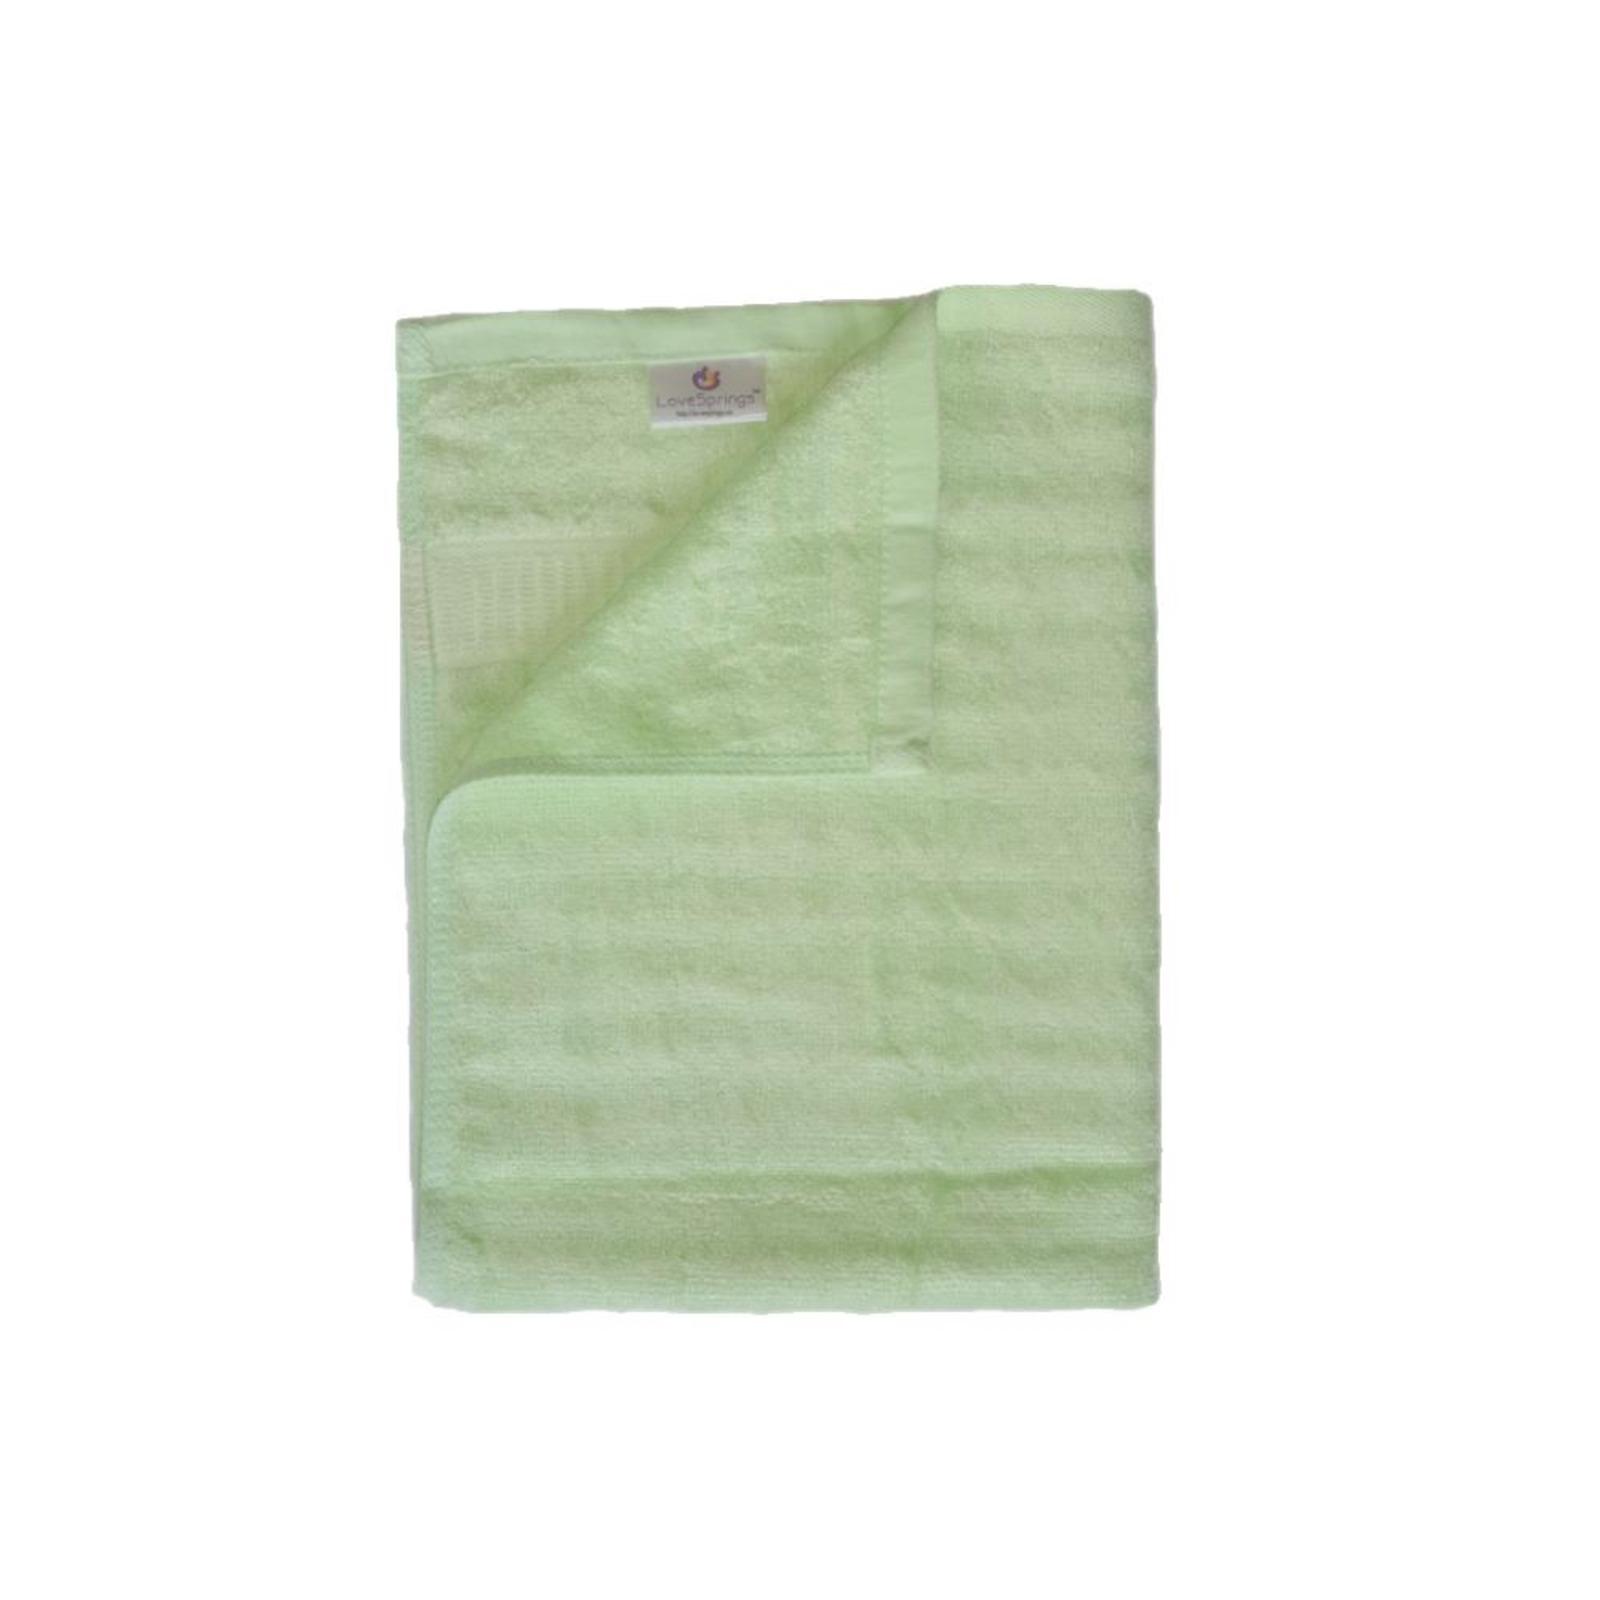 LoveSprings Bamboo fiber bath towel - Green